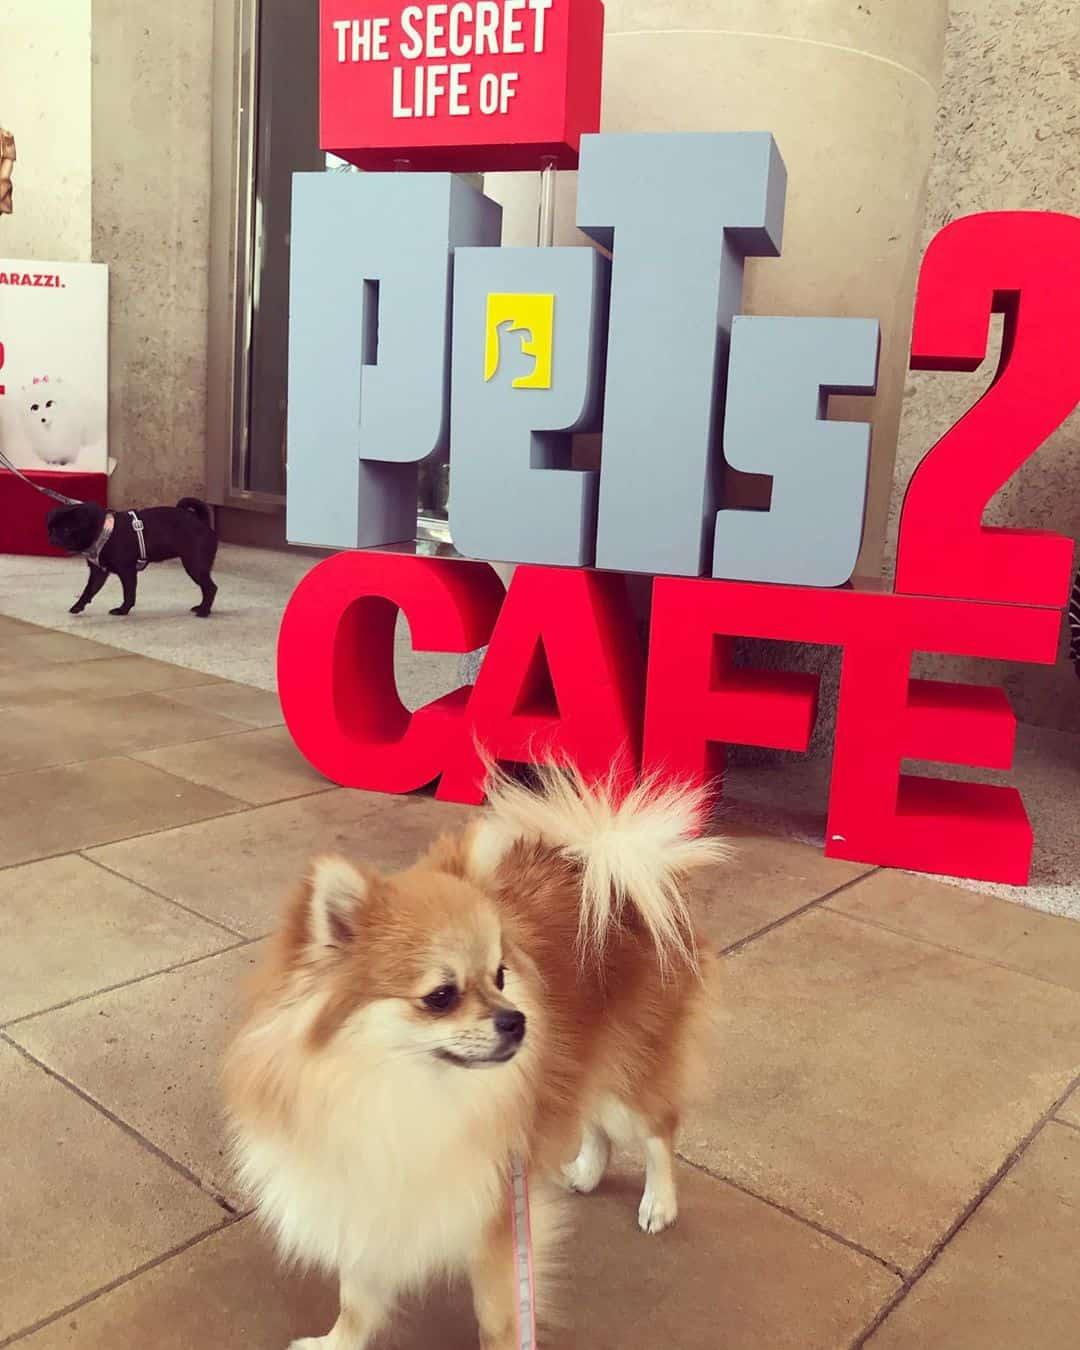 Pomeranian Pop-up Café London Review By Bear and Hannah - Secret Life of Pets